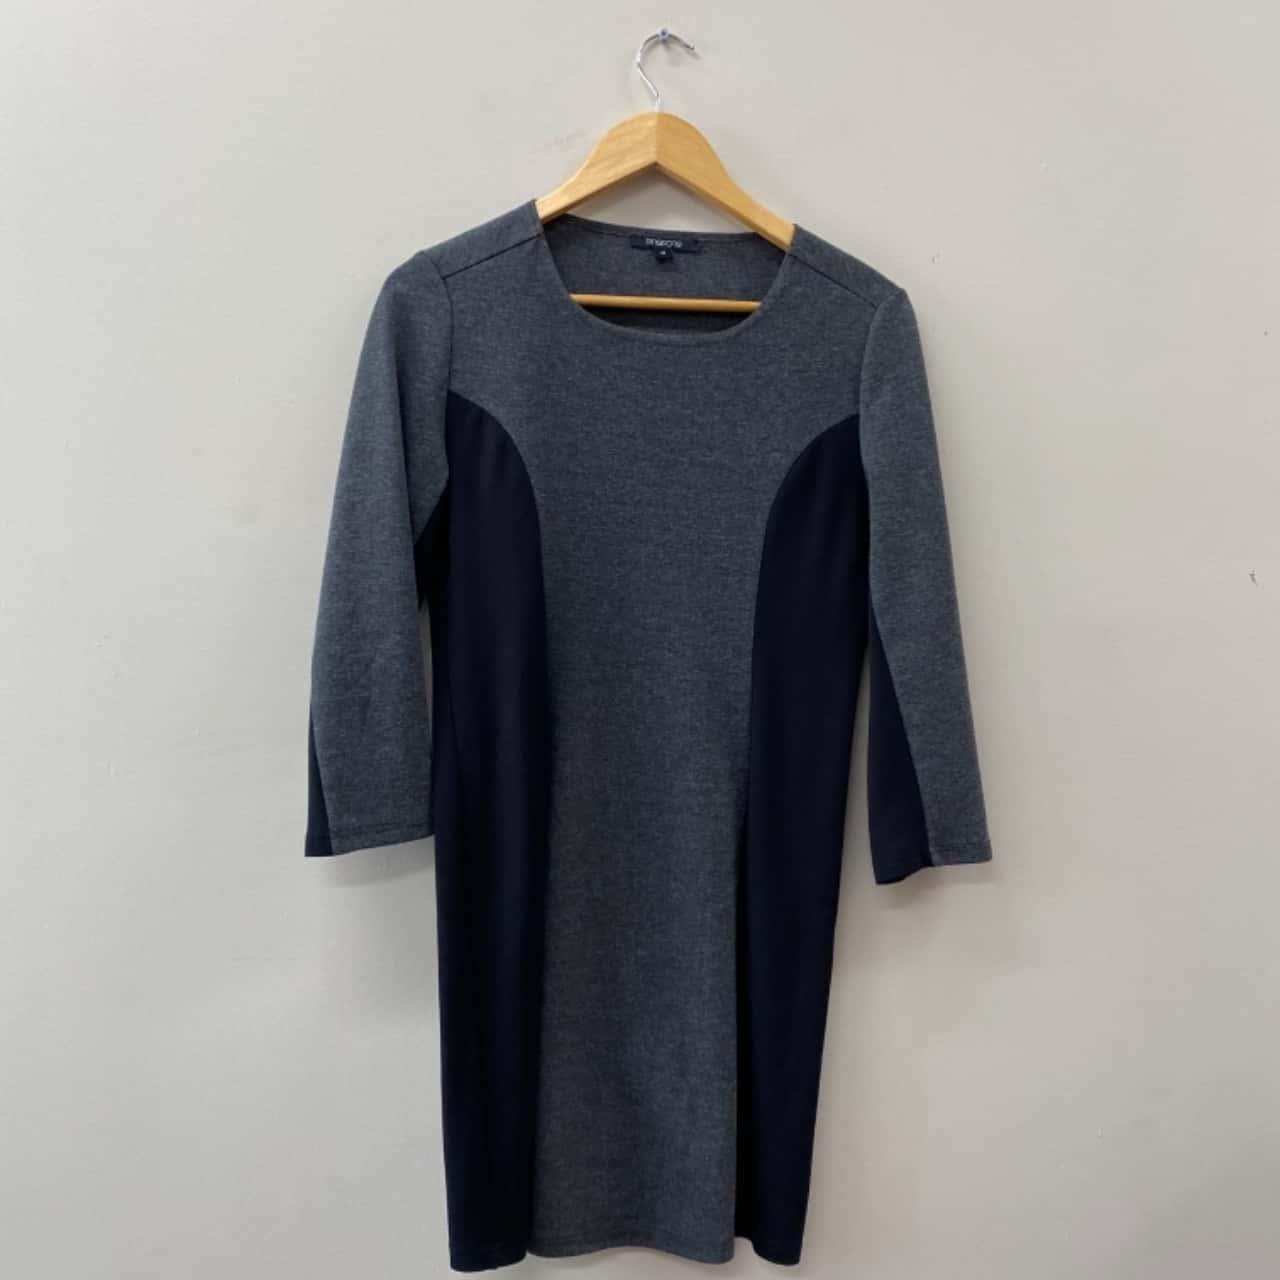 ** REDUCED LAST CHANCE ** Pingpong Women's Dress Size 10 Black /Grey